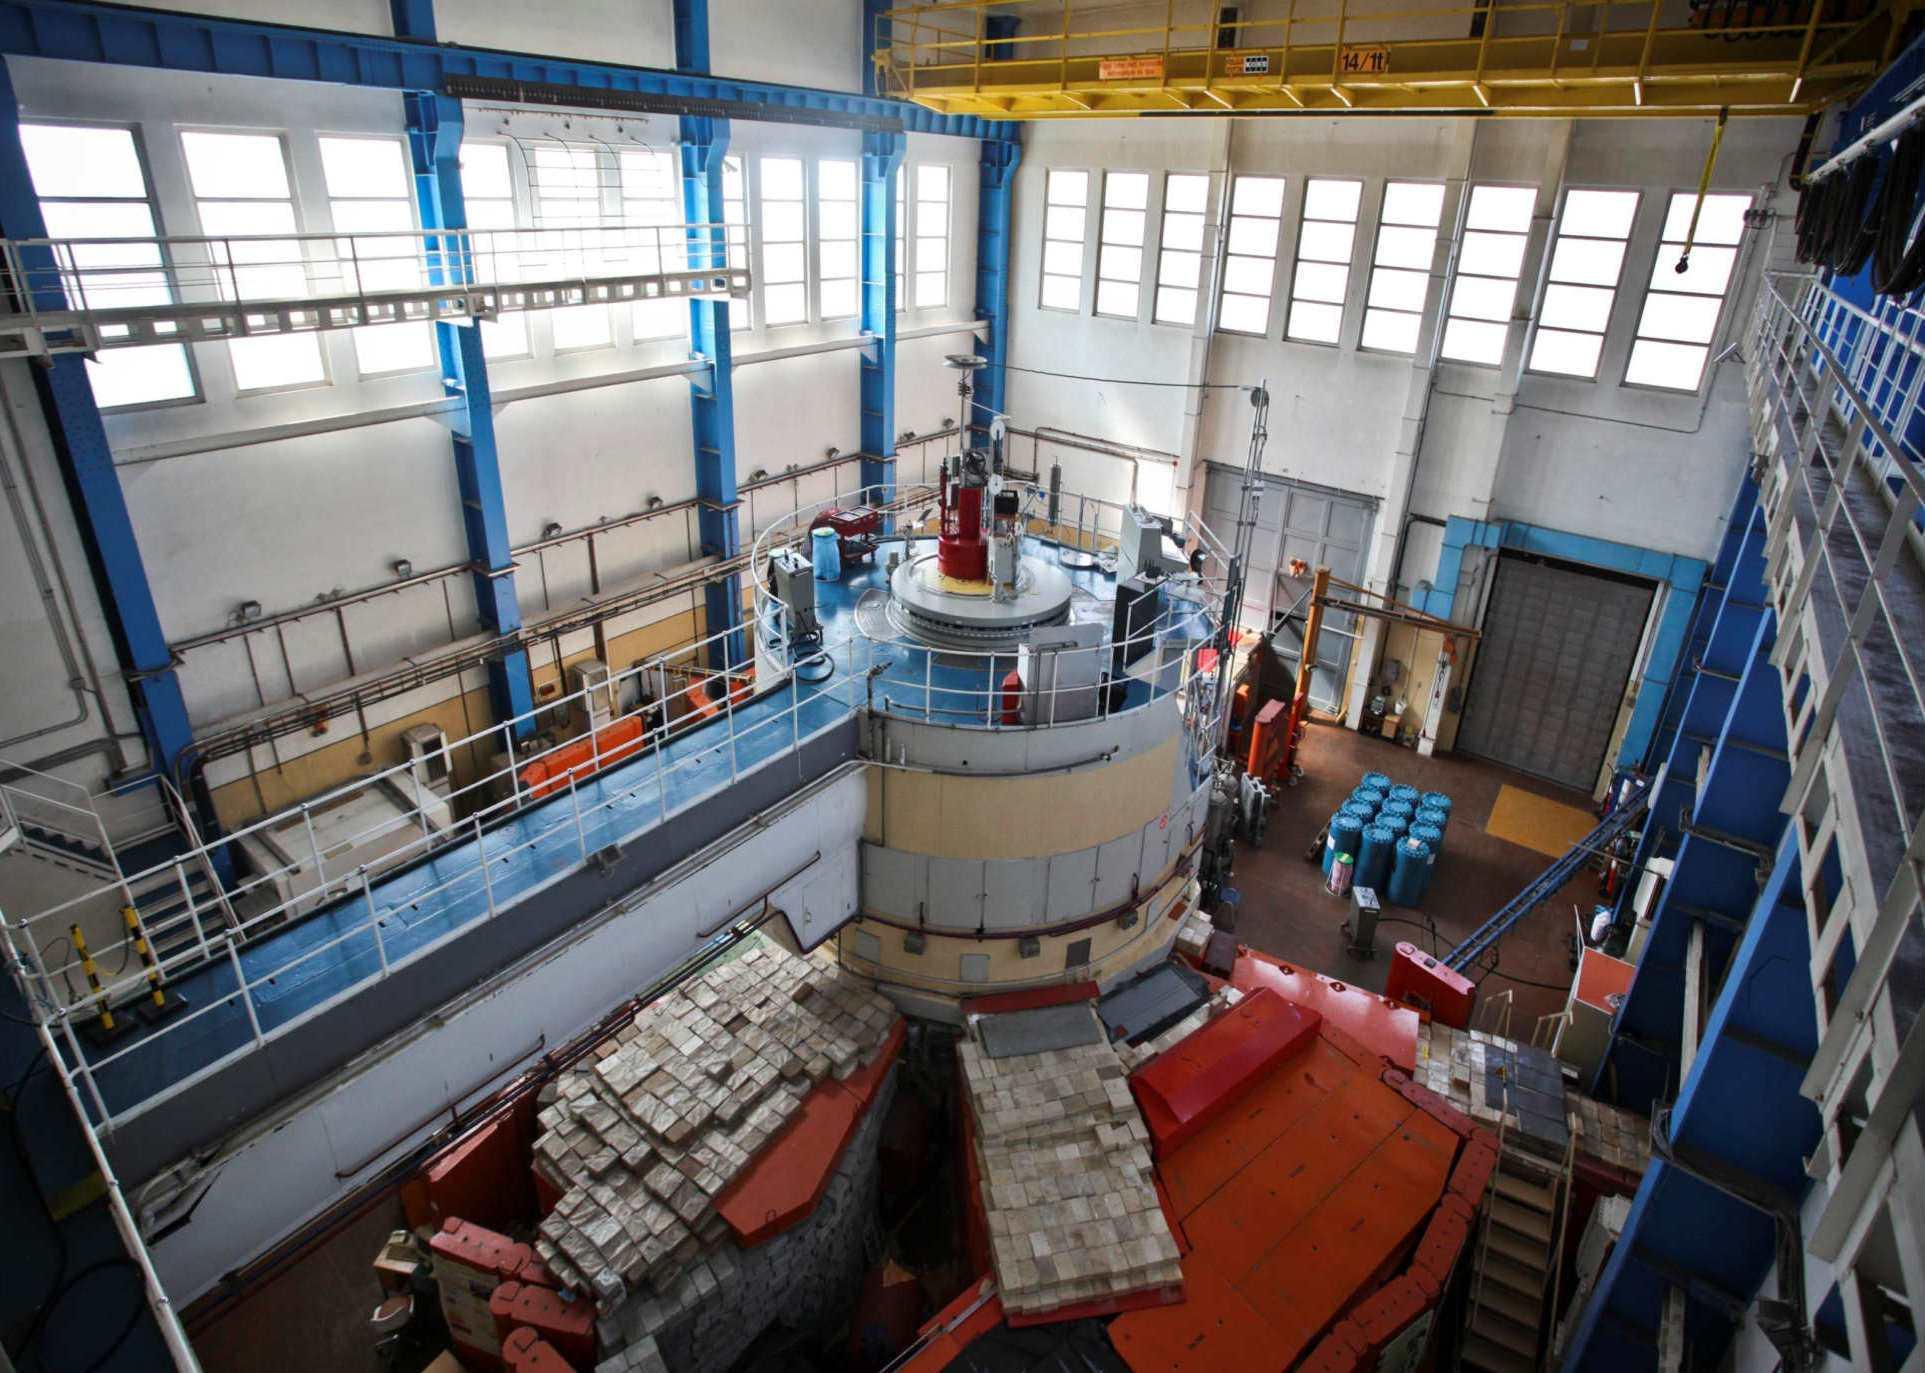 jaderná energie - TVEL dodal do Maďarska jaderné palivo pro výzkumný reaktor - Palivový cyklus (brr reactor hall) 2